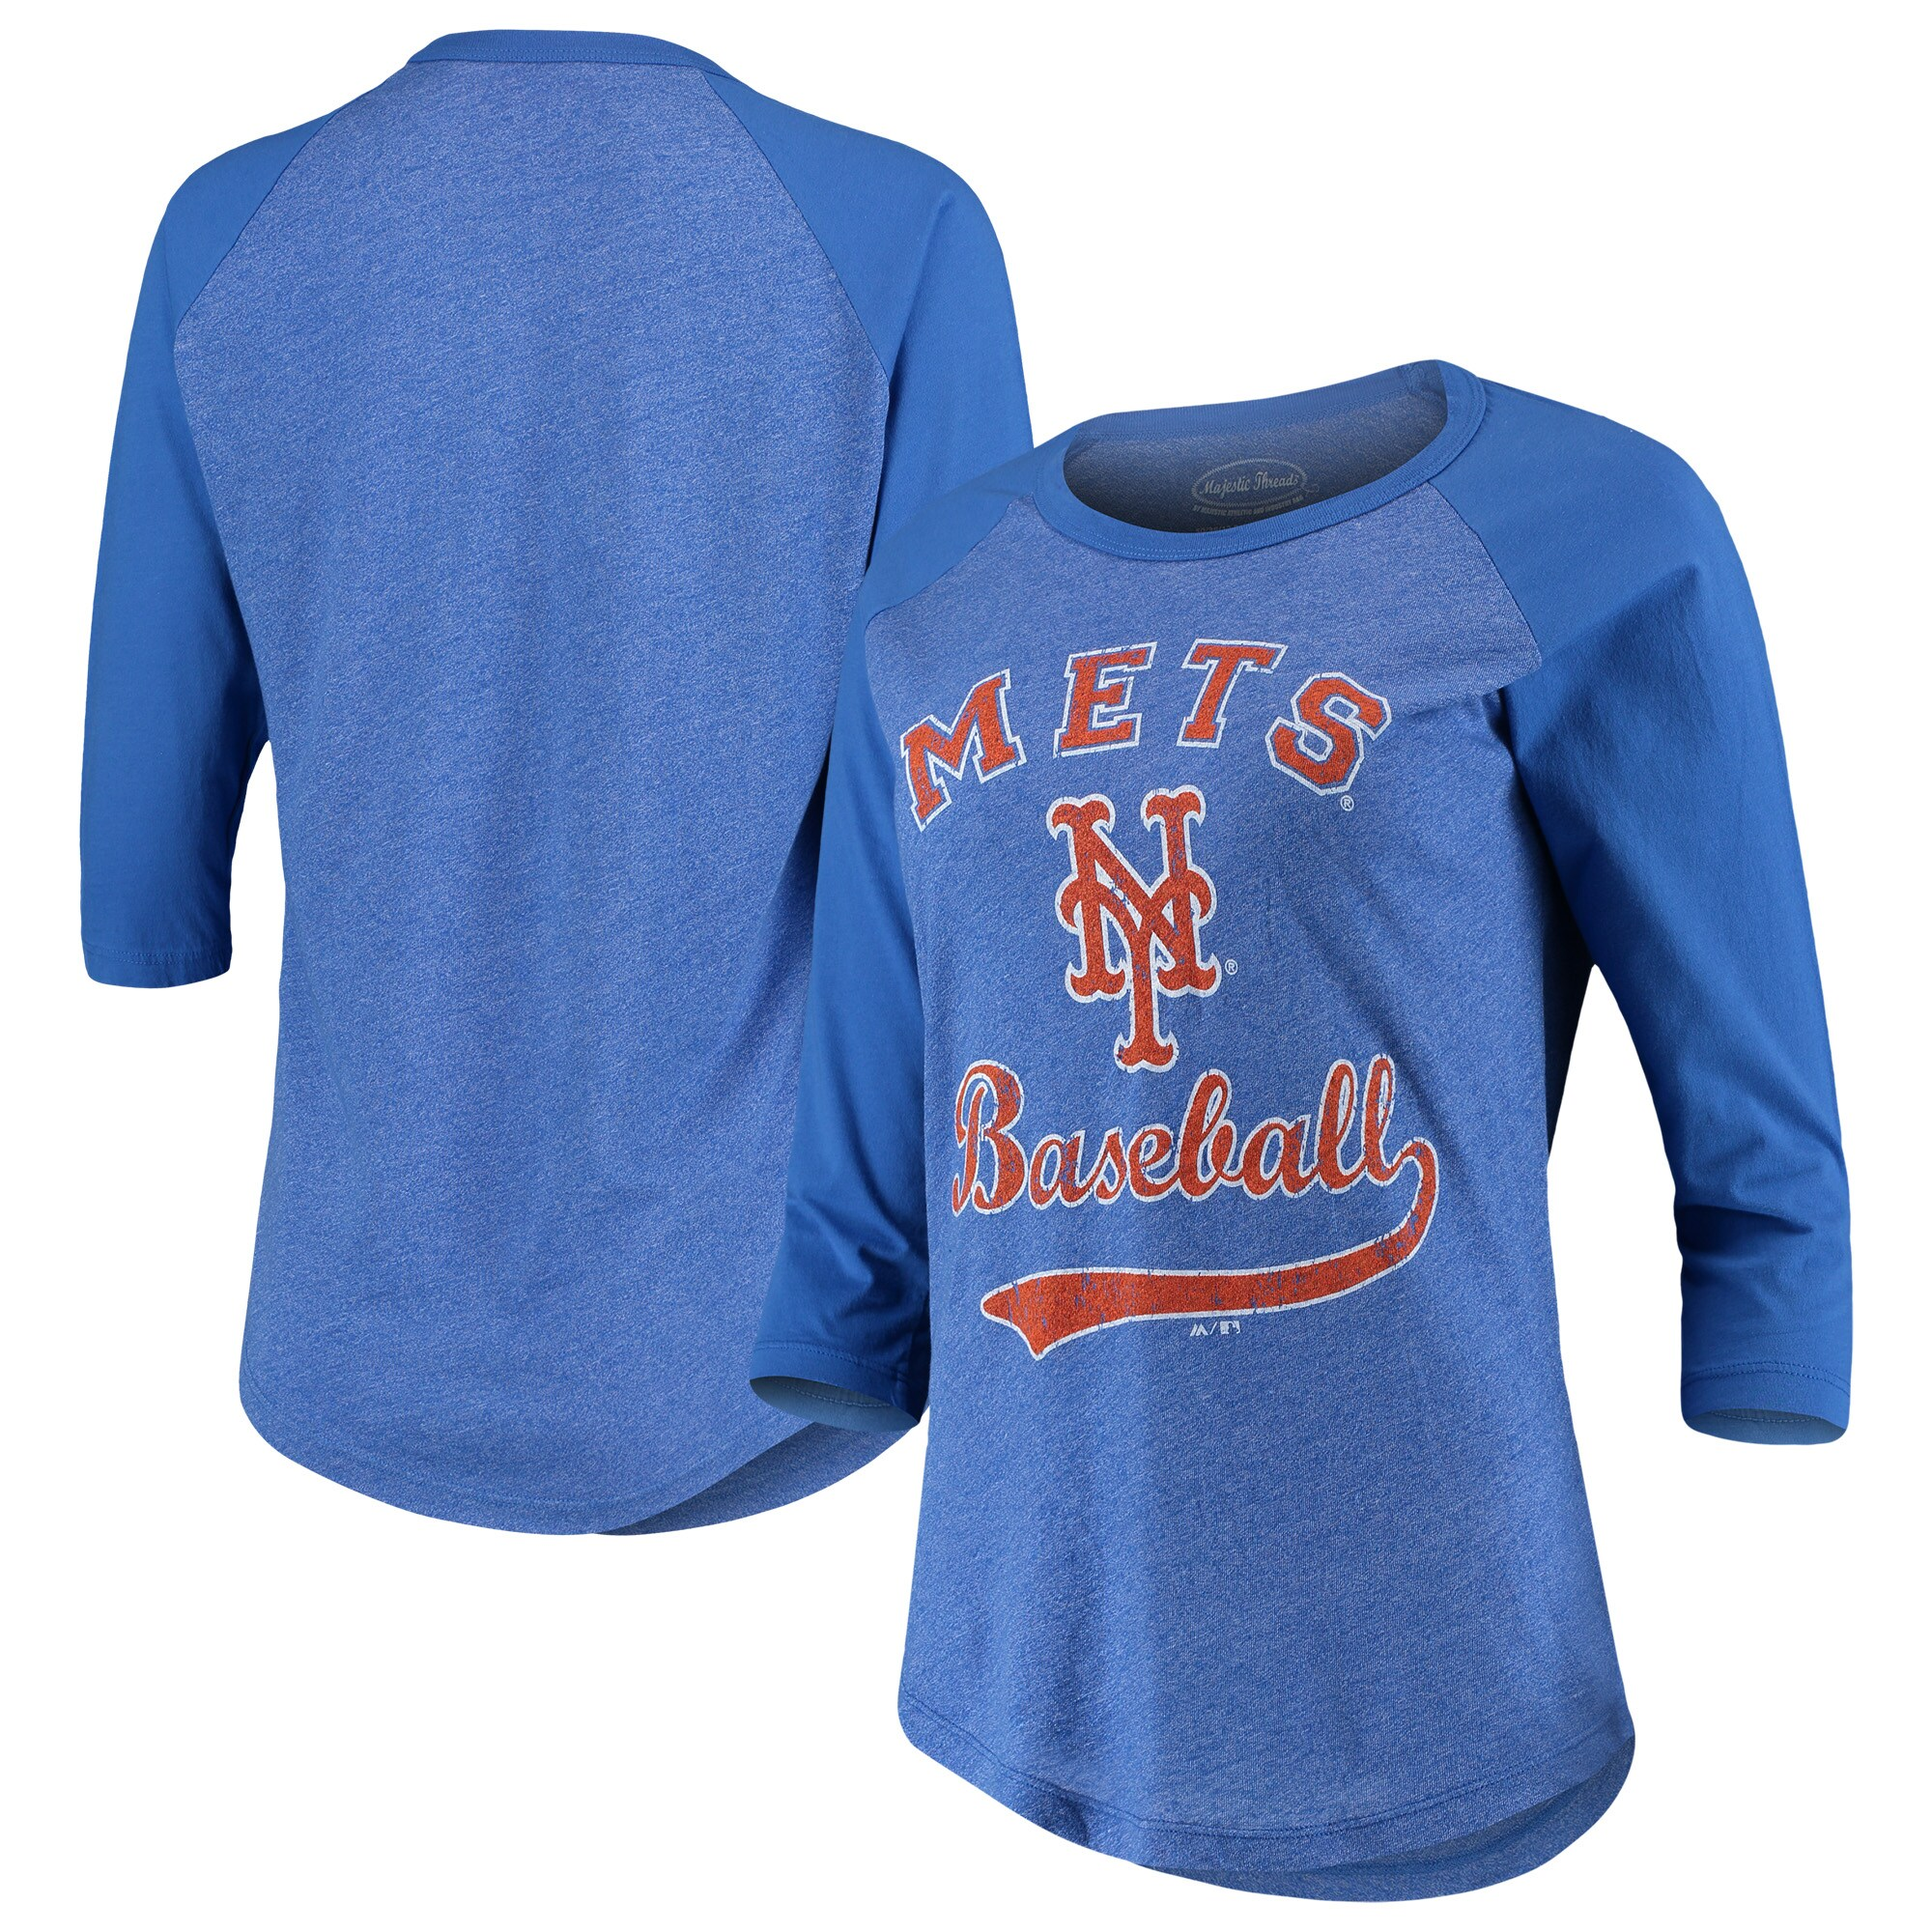 New York Mets Majestic Threads Women's Team Baseball Three-Quarter Raglan Sleeve Tri-Blend T-Shirt - Royal